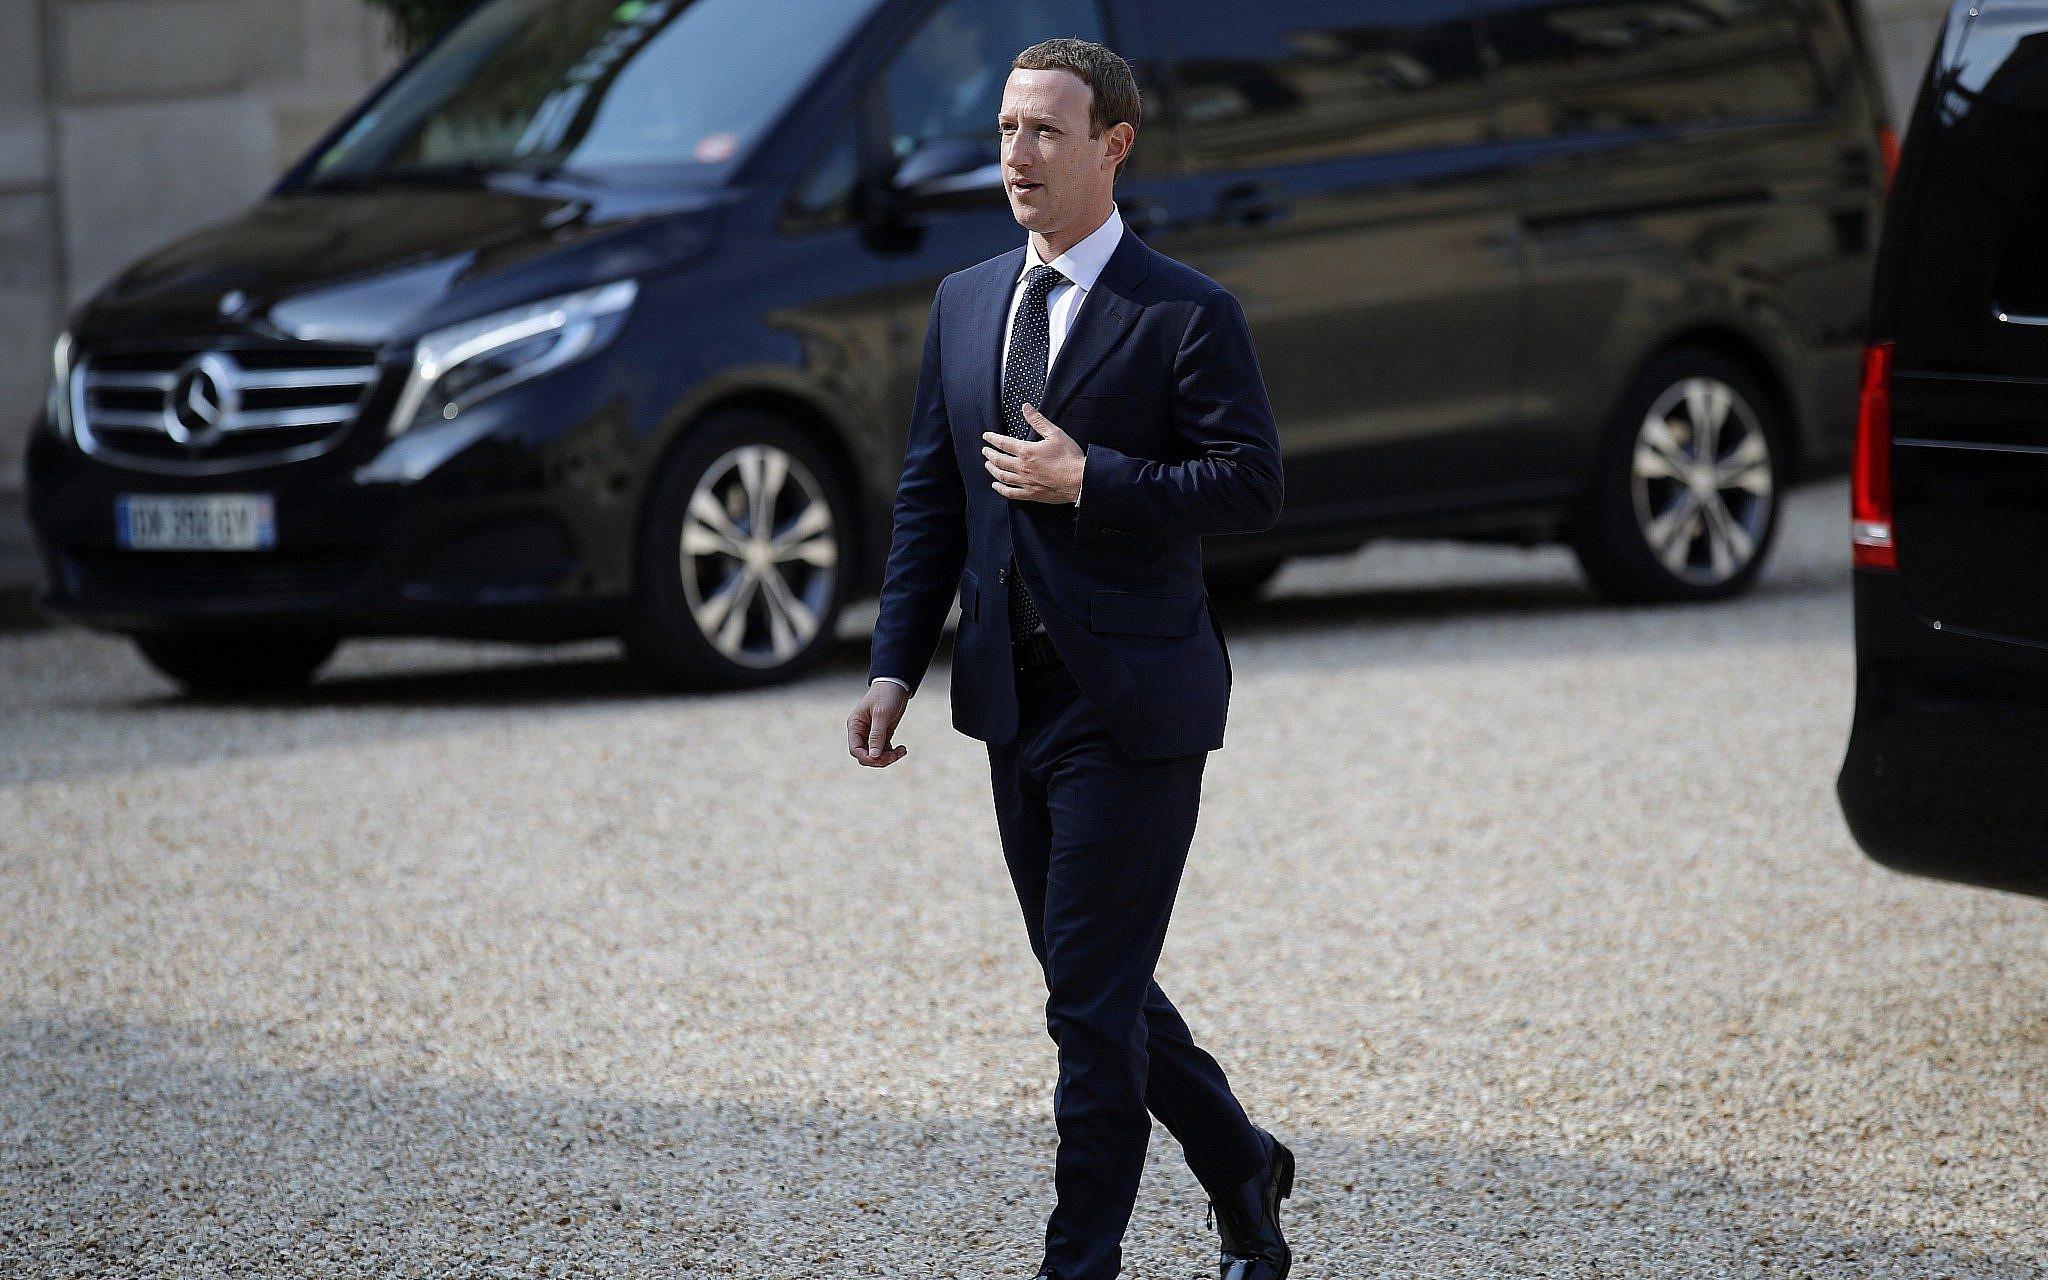 Parliament seizes cache of Facebook documents in 'unprecedented move'